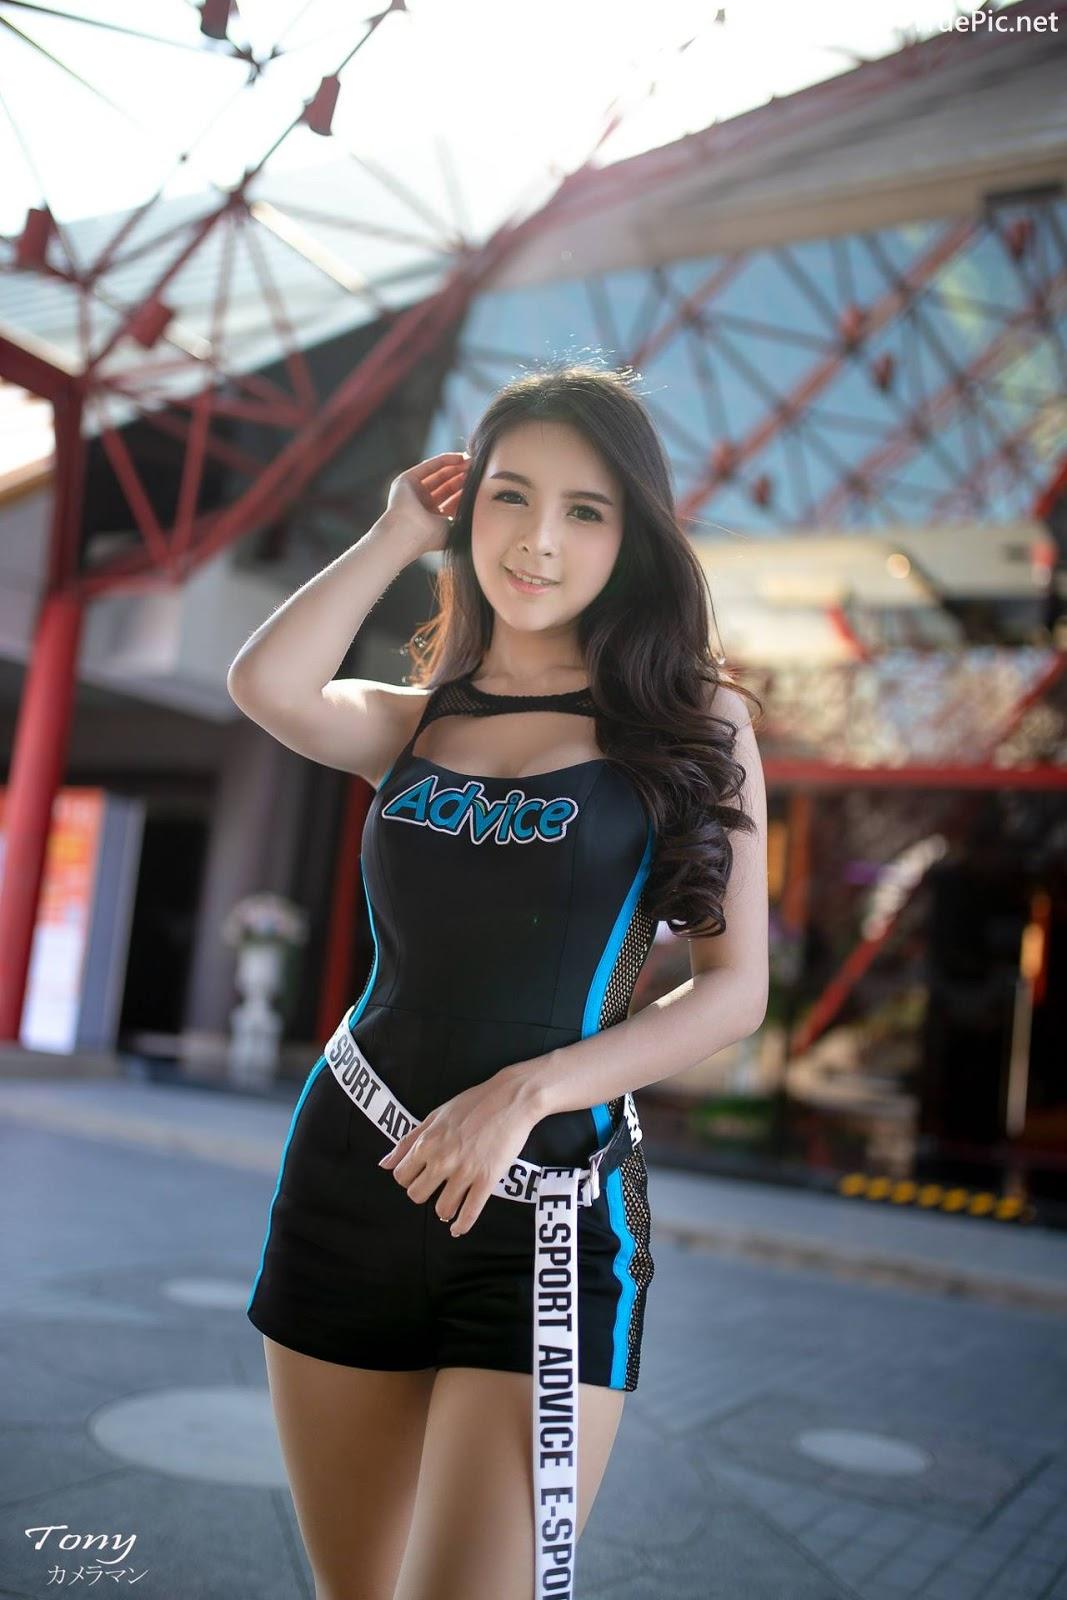 Image-Thailand-Hot-Model-Thai-PG-At-Commart-2018-TruePic.net- Picture-19